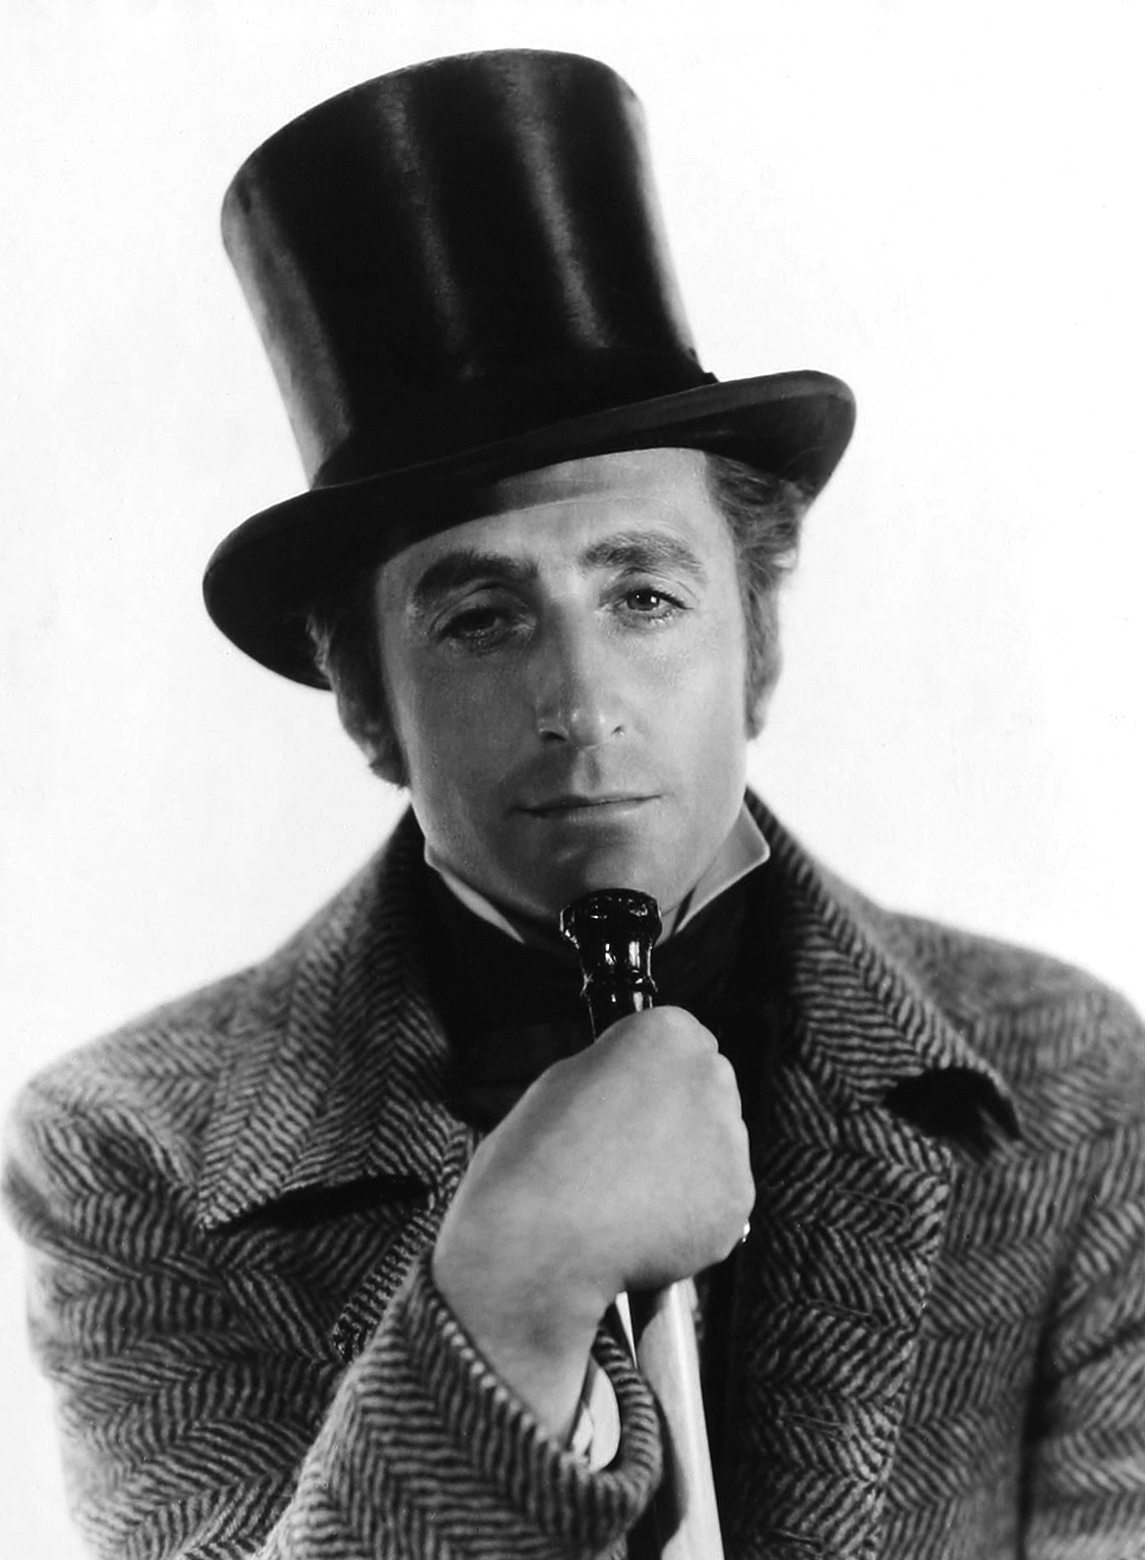 Basil Rathbone in David Copperfield as Mr. Murdstone, Classic Movie Actor, George Cukor